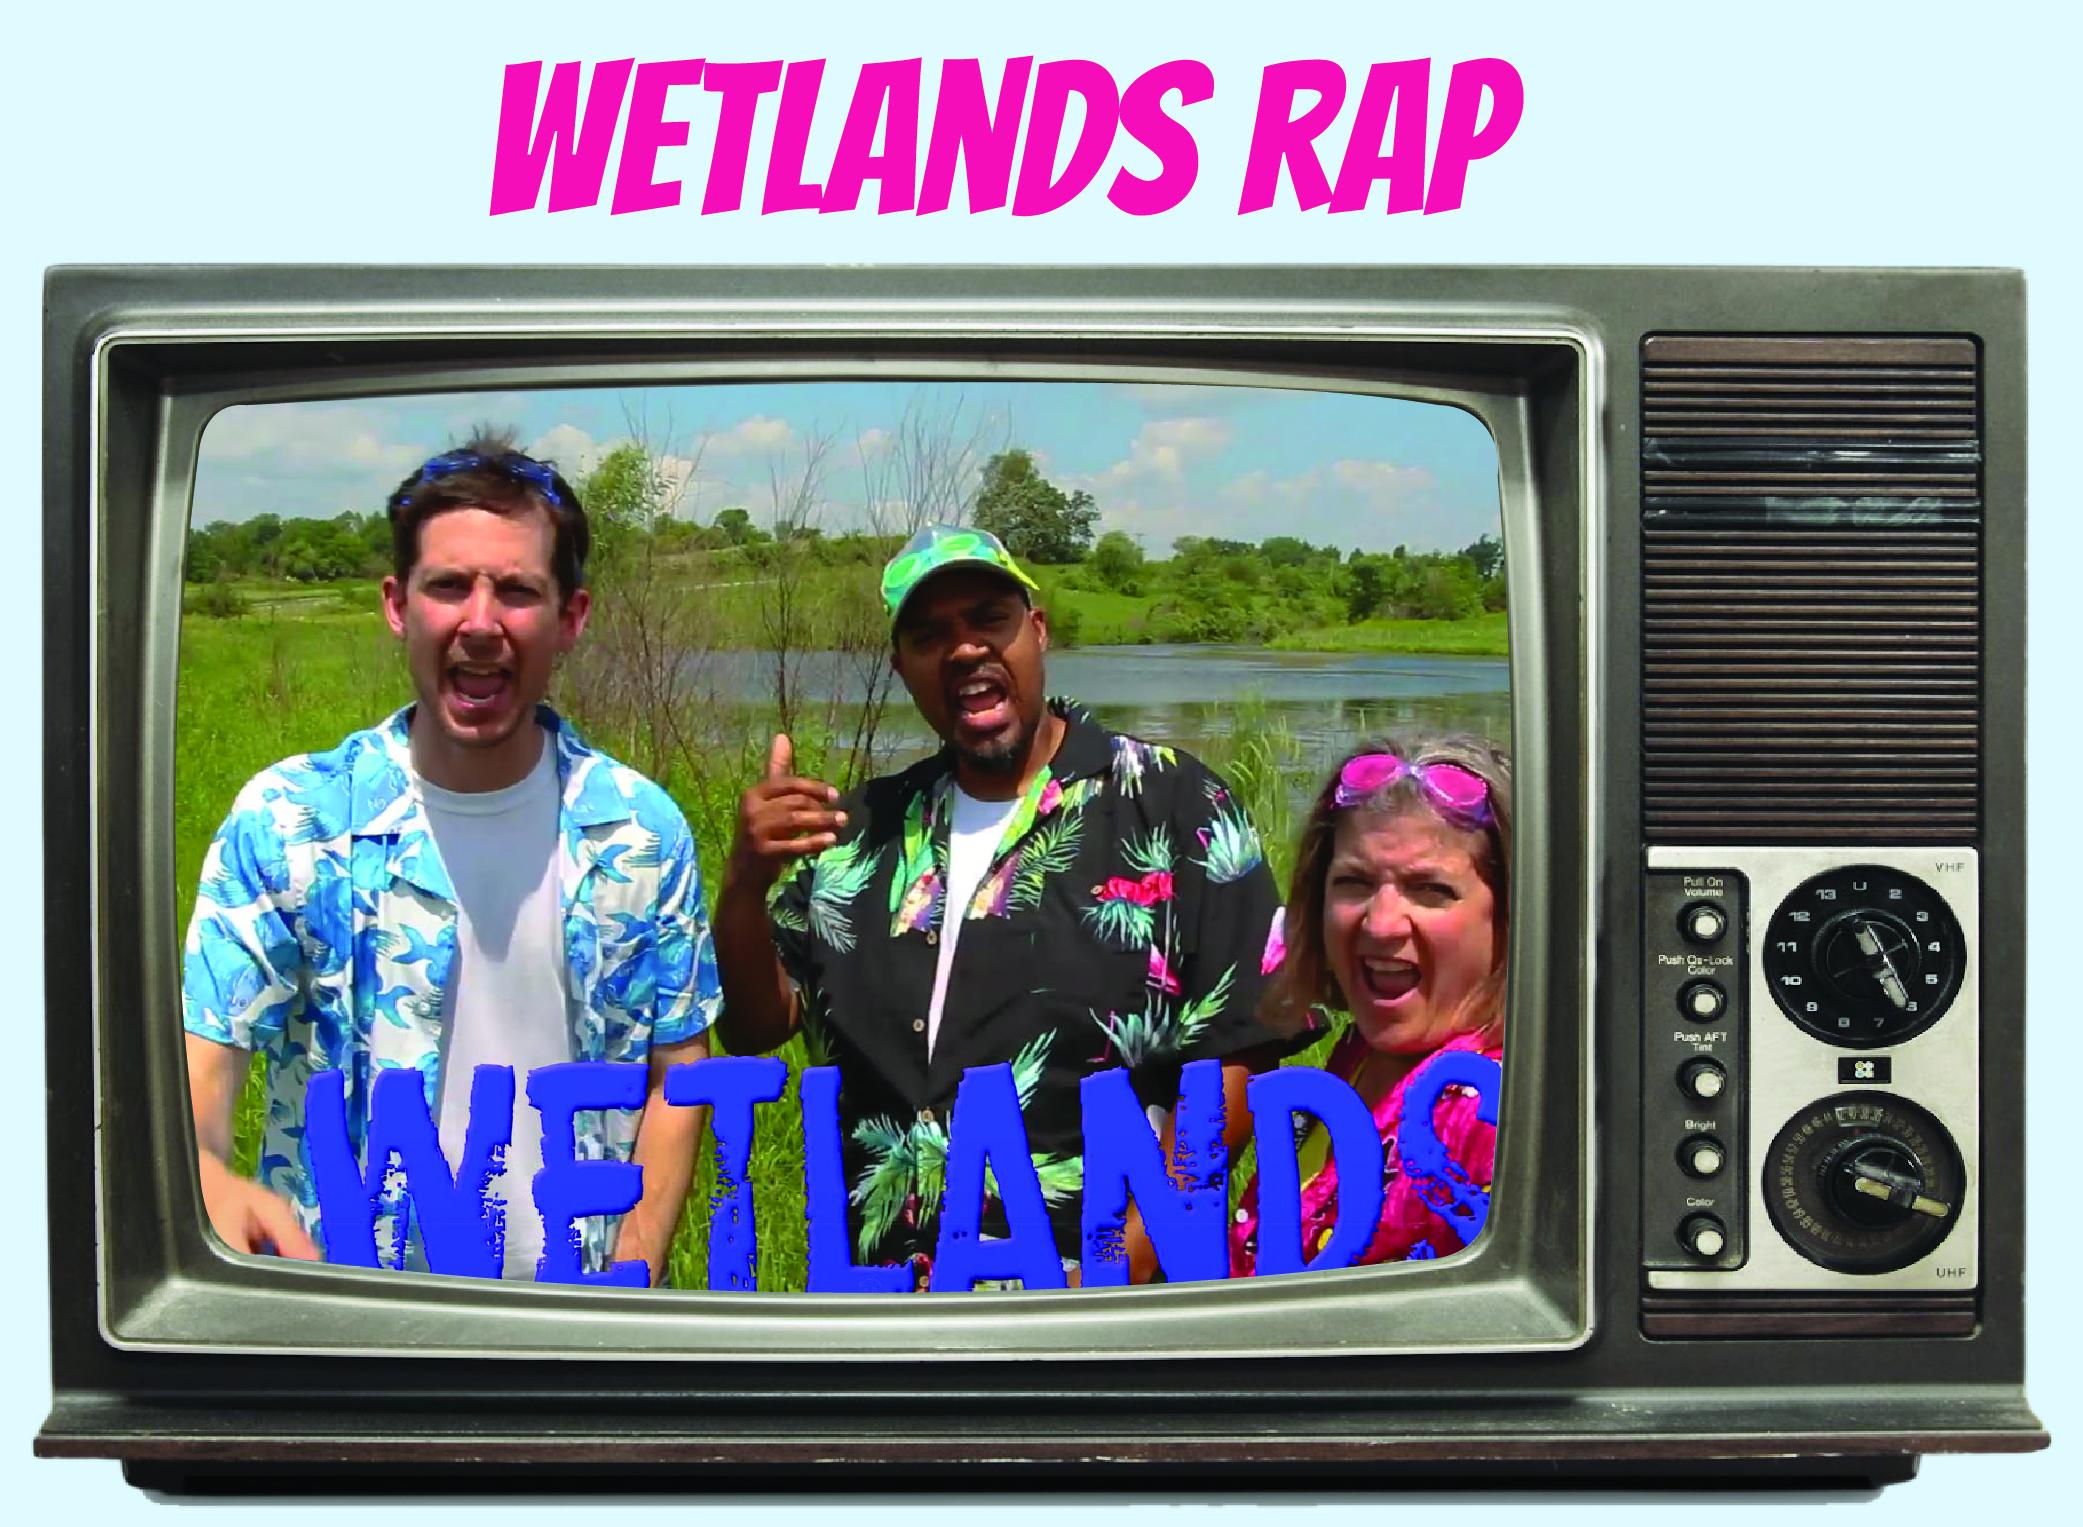 Website-tv-wetlandrap.jpg